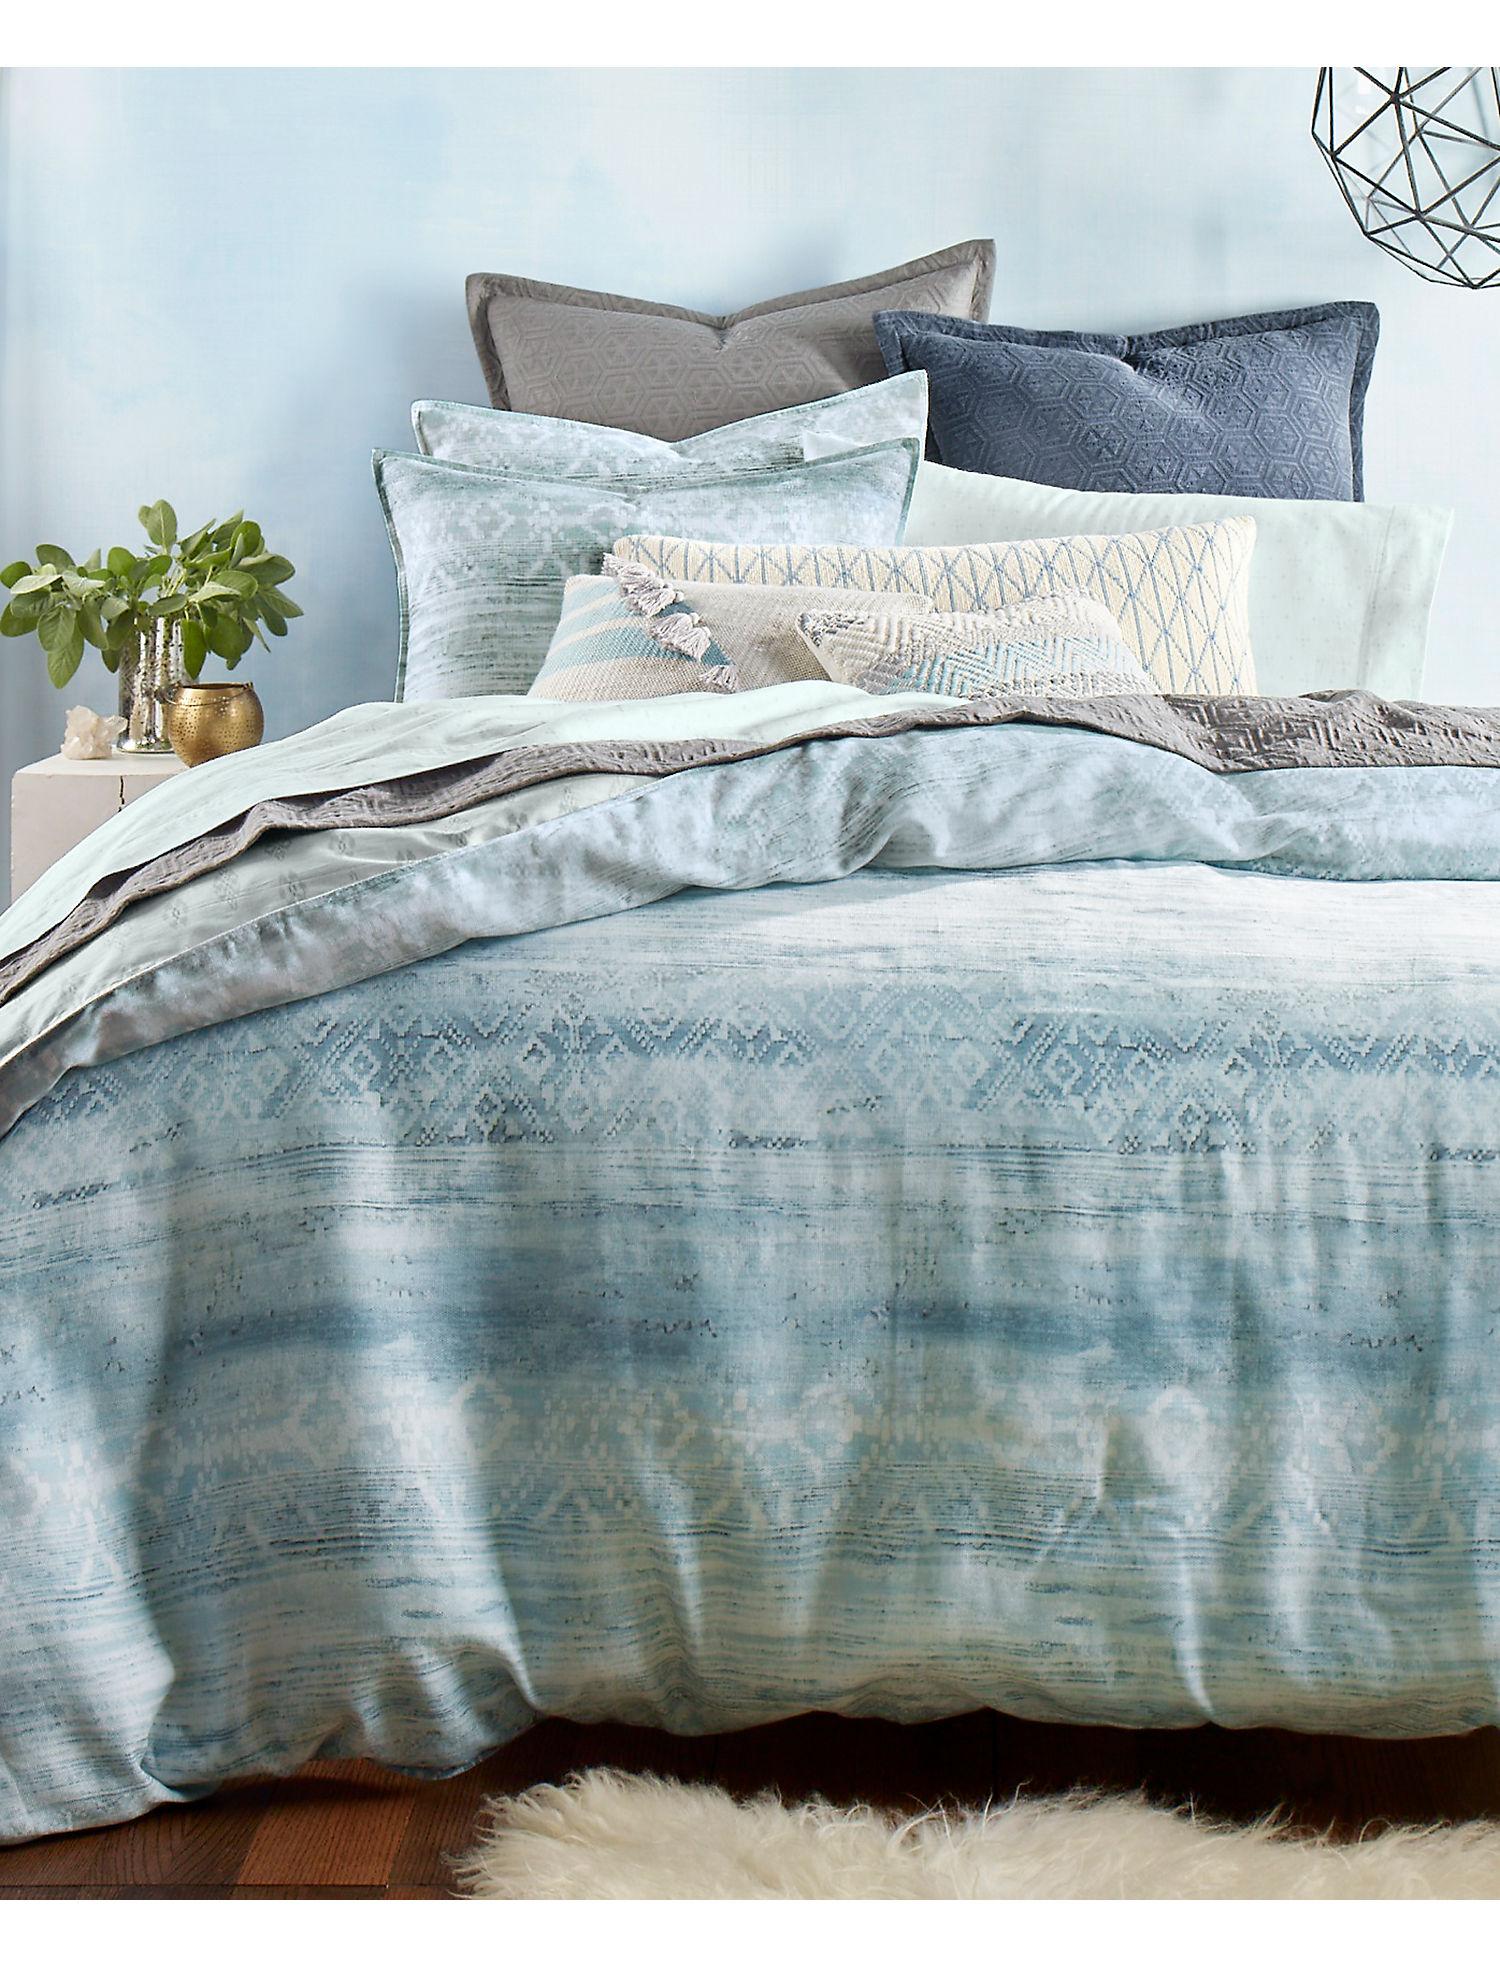 Laguna Bedroom Collection - Lucky Brand 2.0